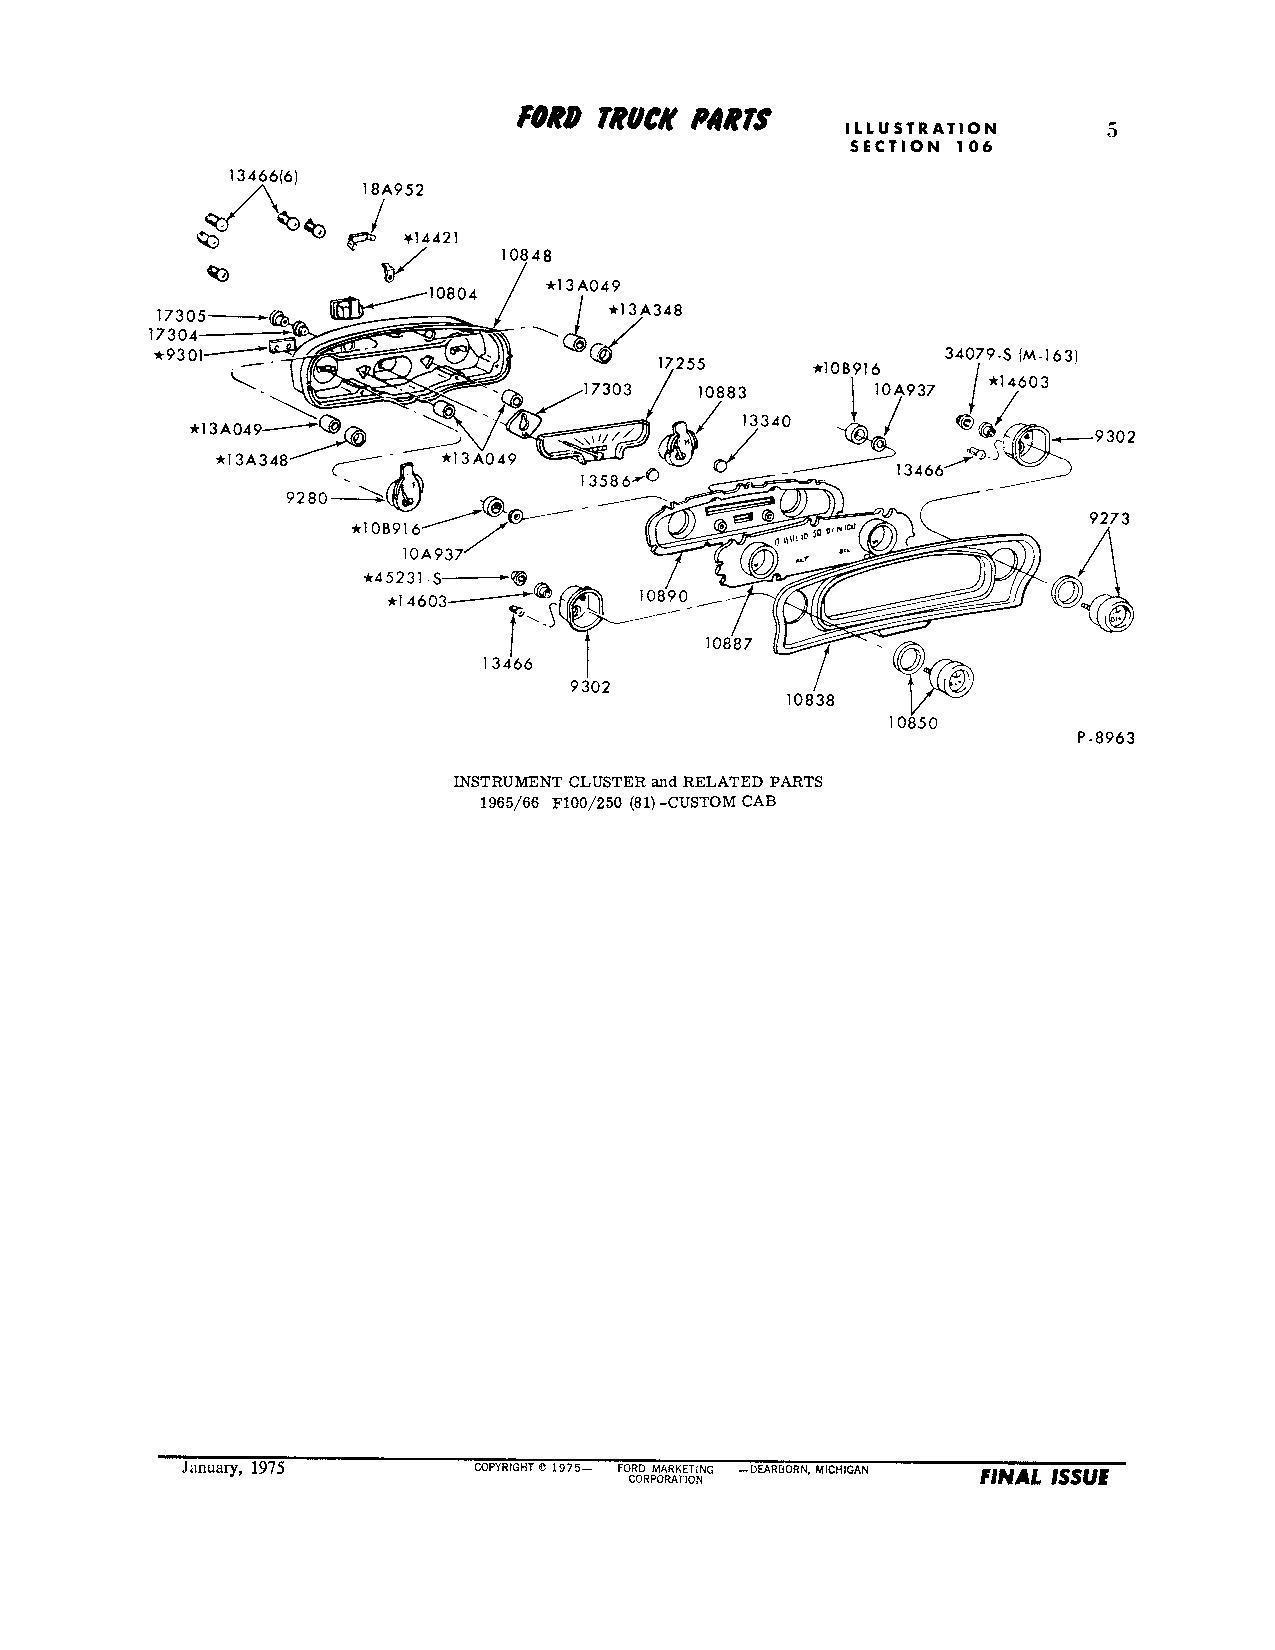 66 F250 Instrument Cluster Diagram